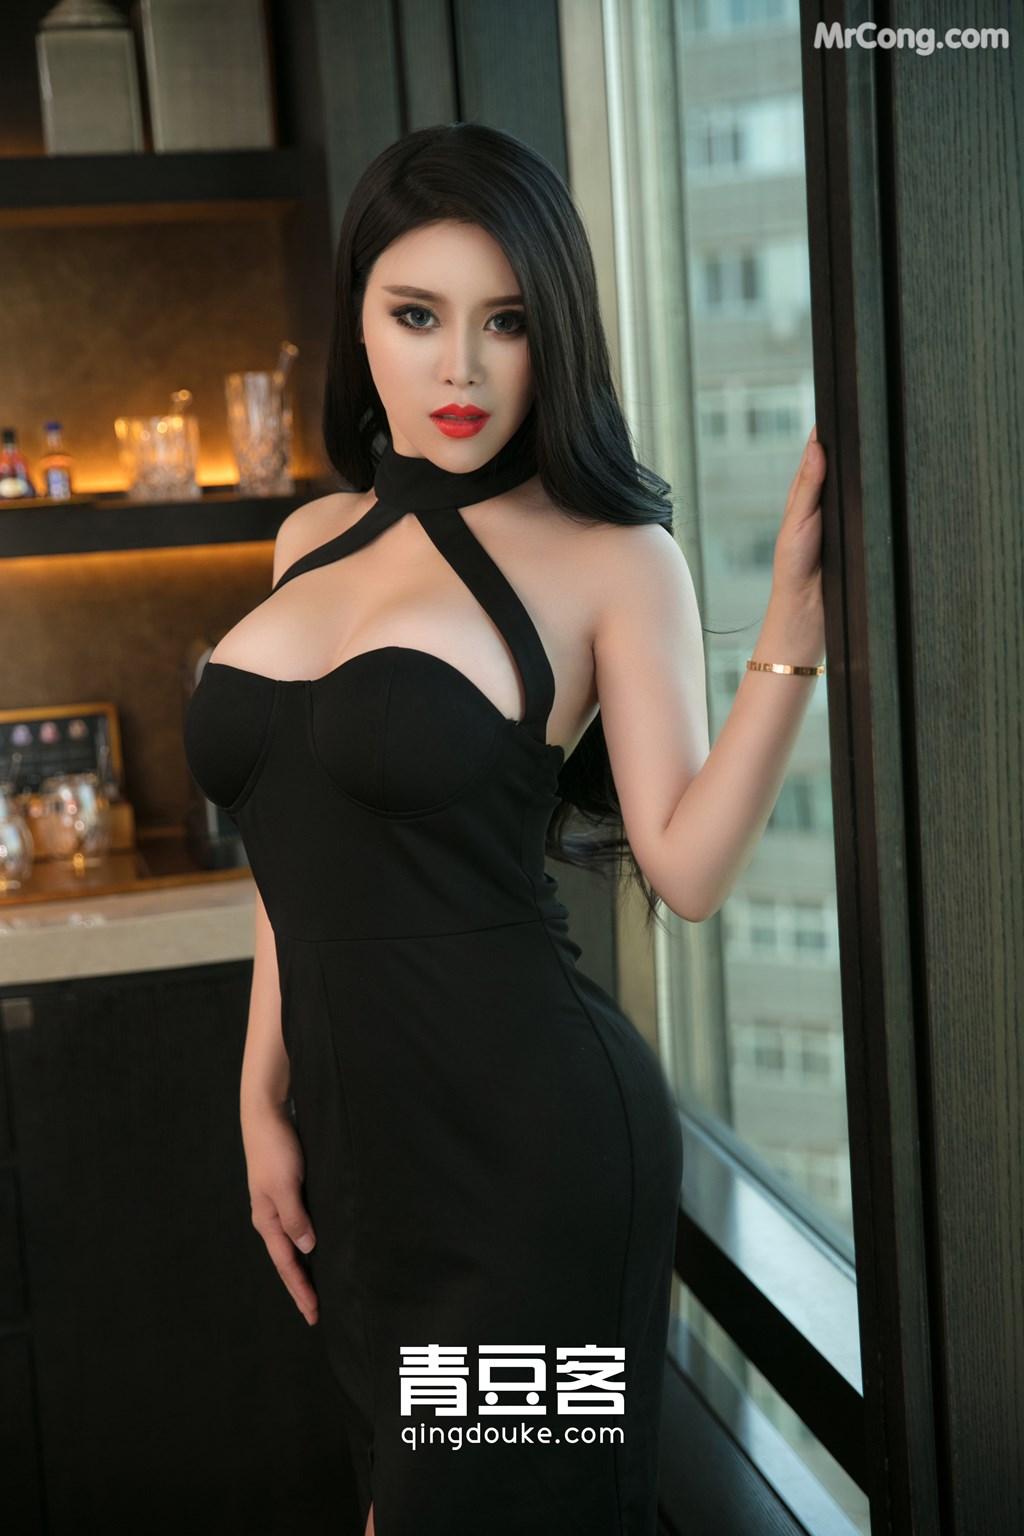 Image QingDouKe-2017-11-05-Ke-Rui-Na-MrCong.com-006 in post QingDouKe 2017-11-05: Người mẫu Ke Rui Na (可蕊娜) (48 ảnh)